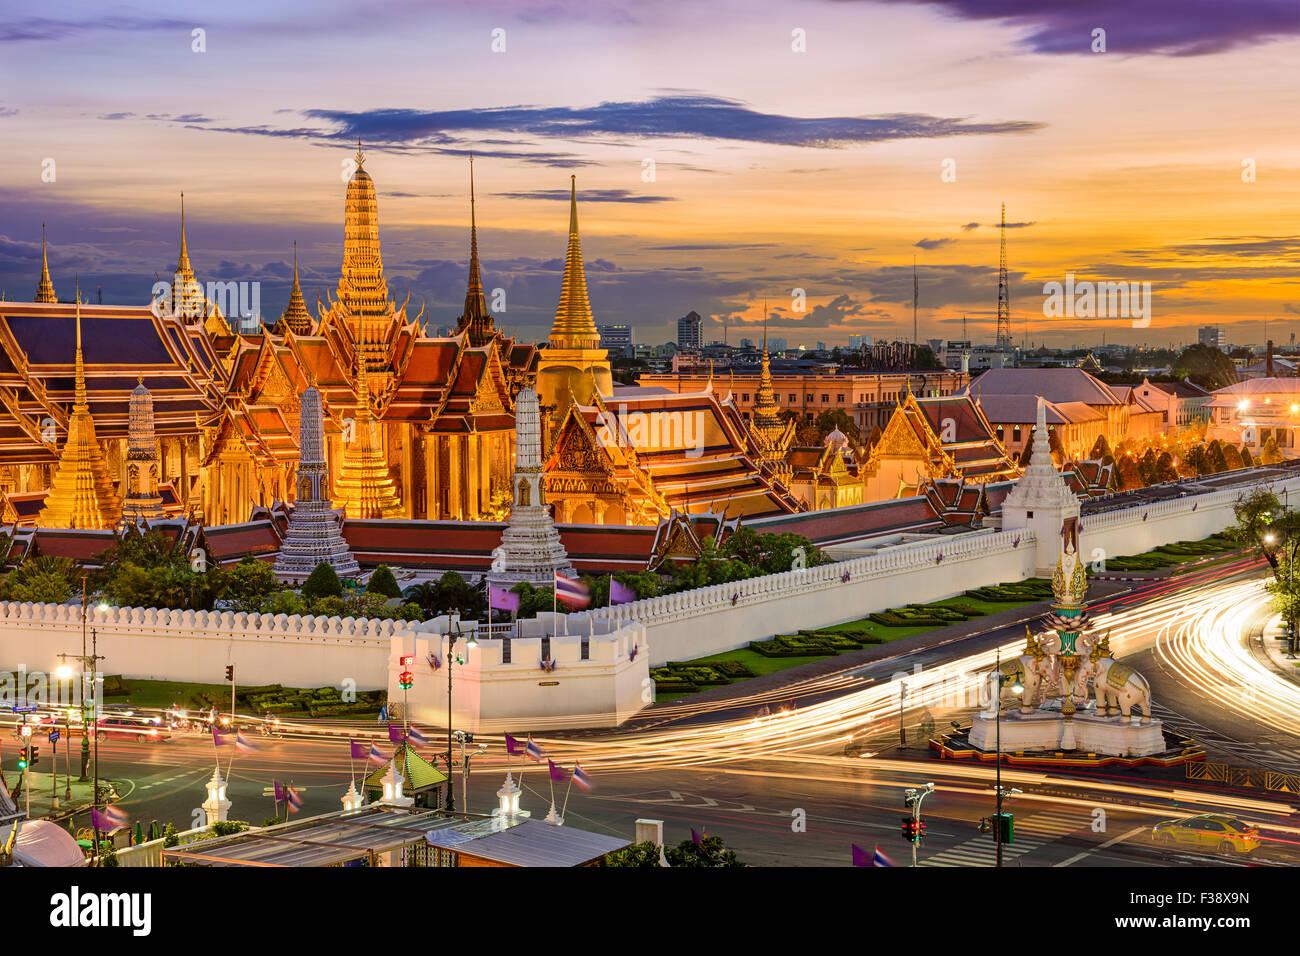 Bangkok, Thailand at the Temple of the Emerald Buddha and Grand Palace. - Stock Image